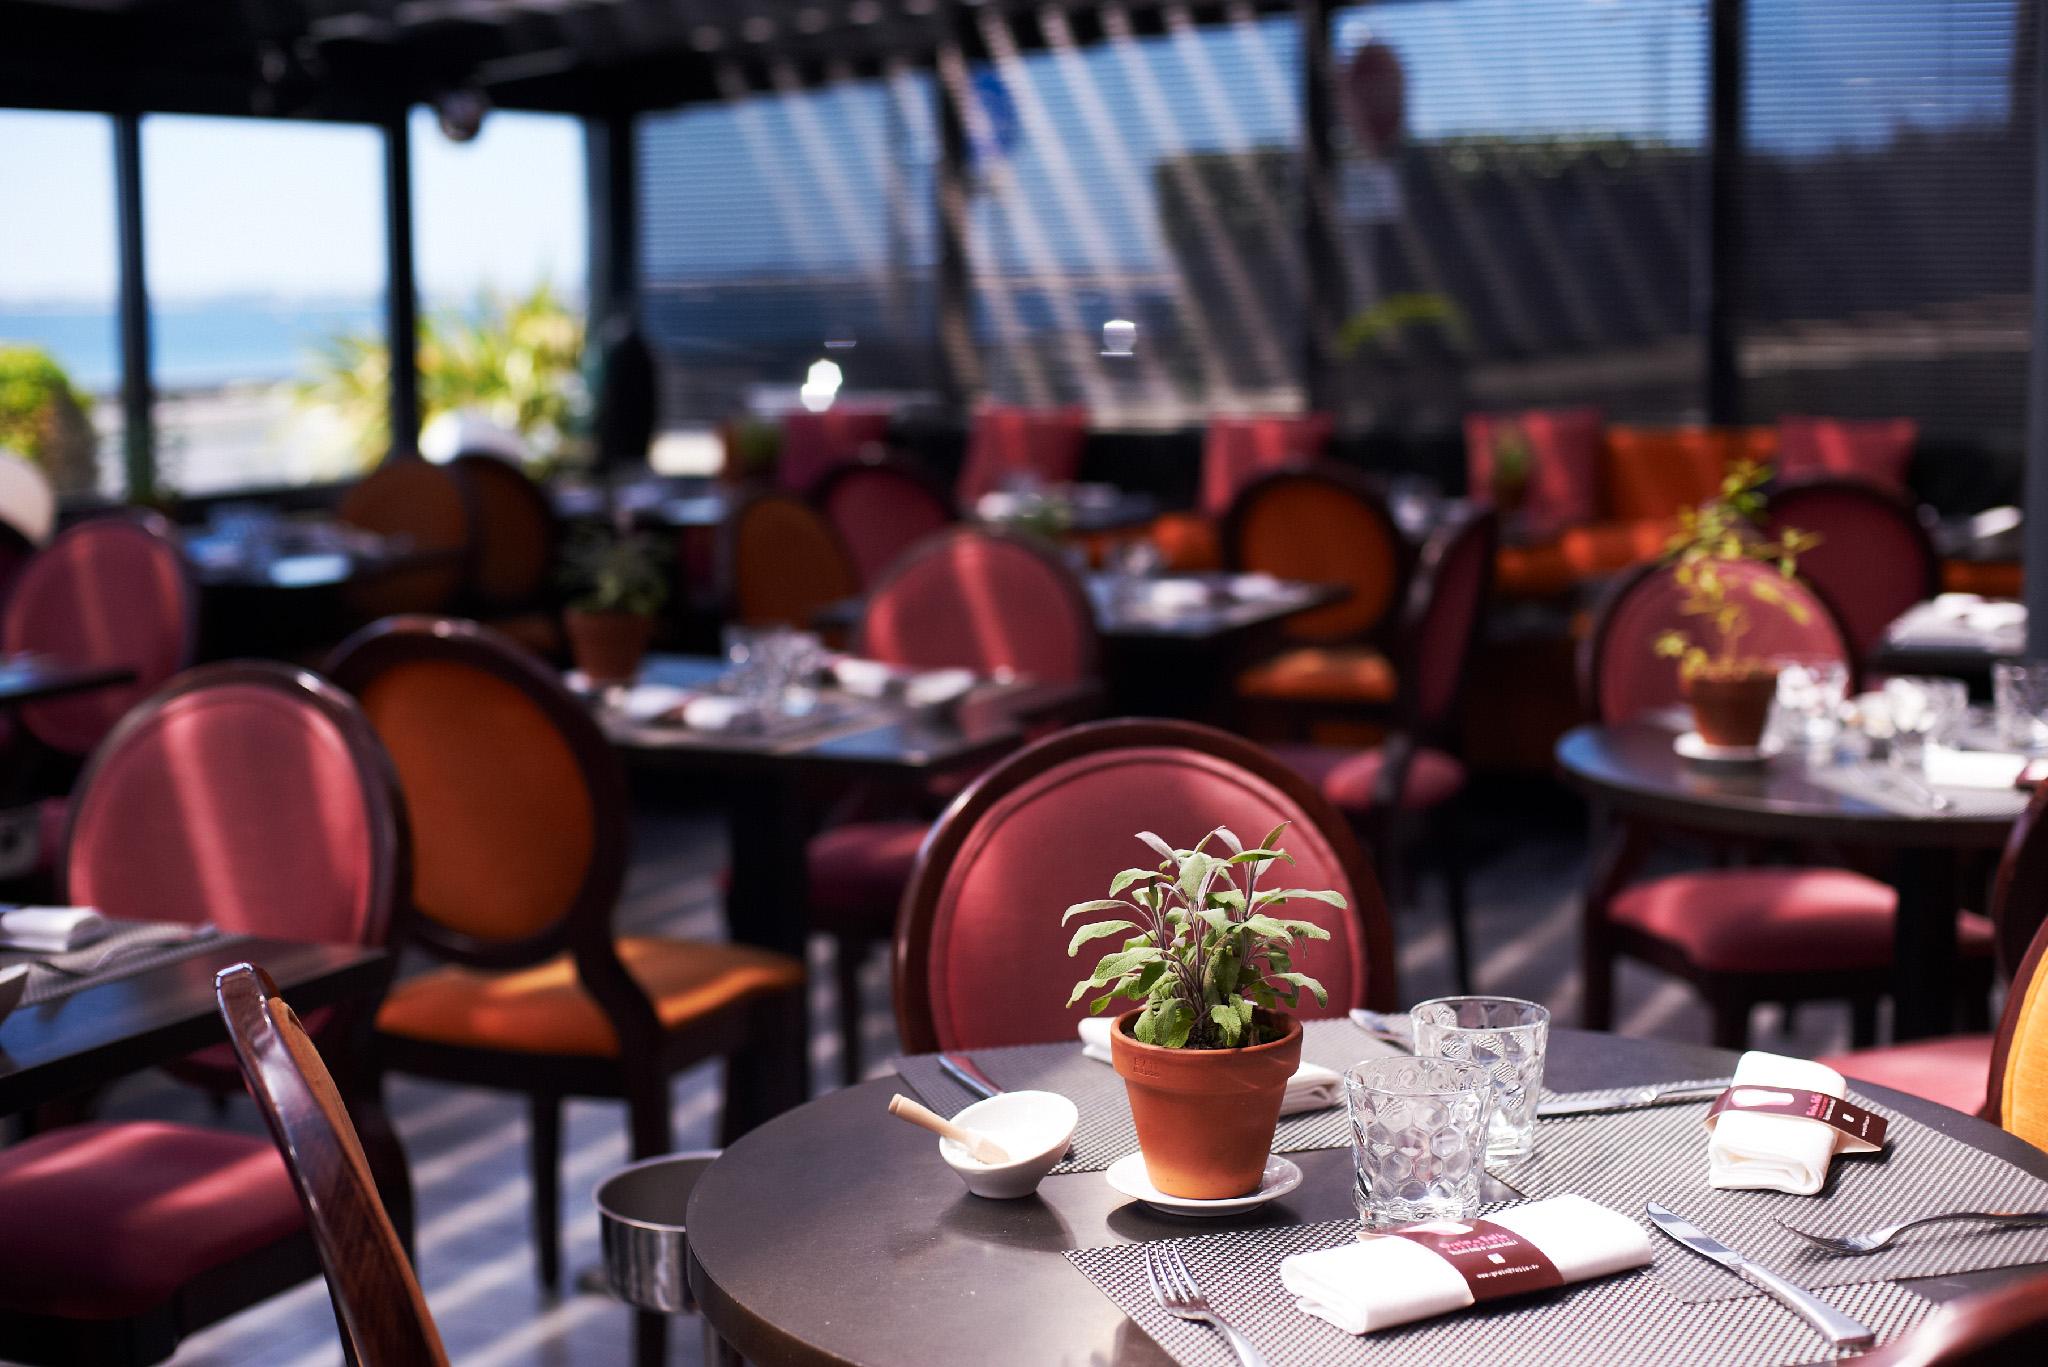 50_photographie_hotel_restaurant_nantes